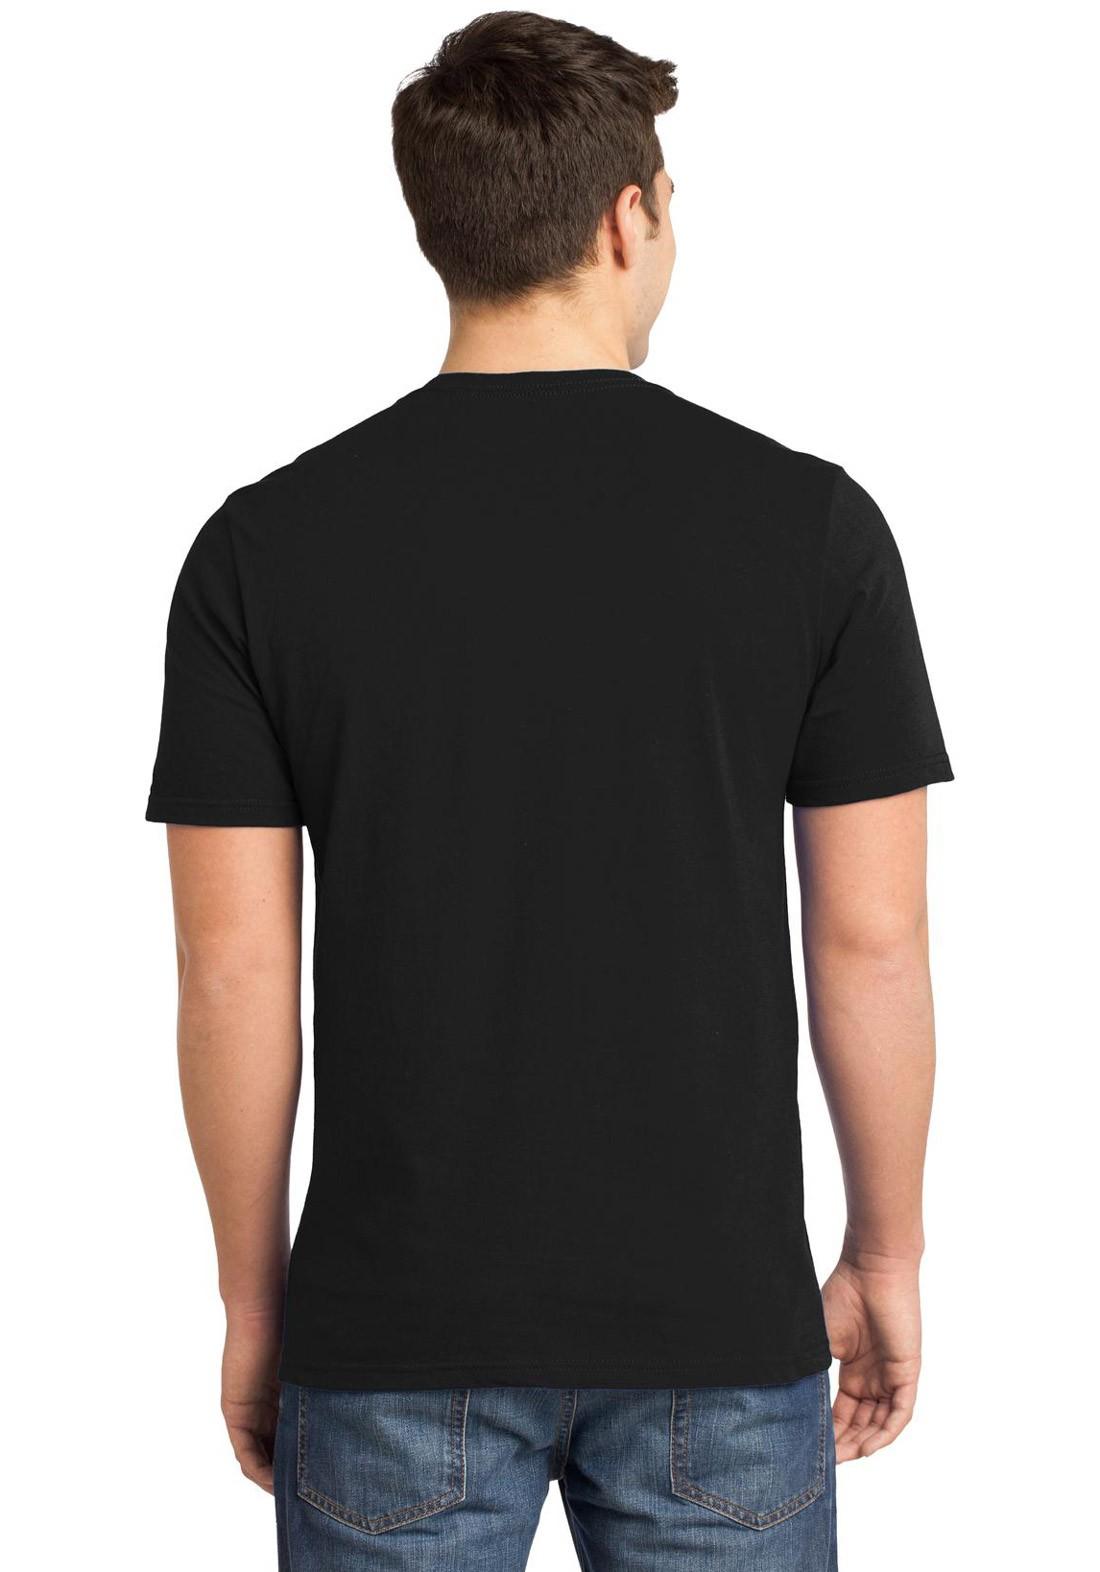 Camiseta Masculina Cristã Jesus Religiosa Cruz ER_111